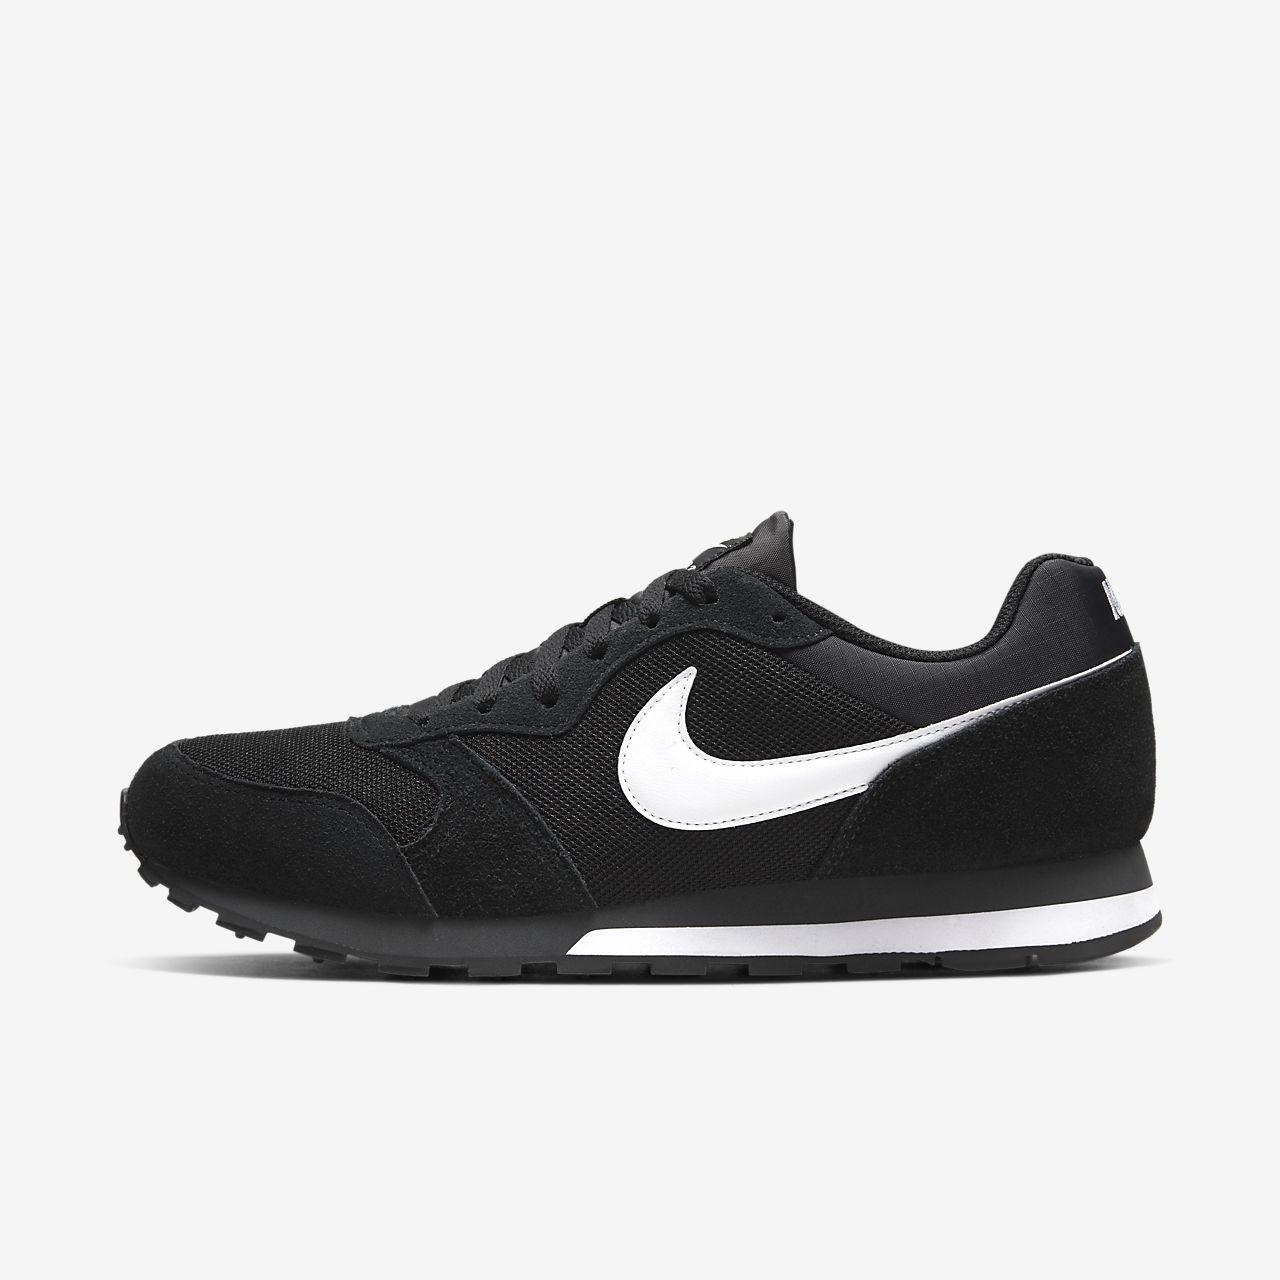 Nike Erkek Ayakkabı Md Runner 2 749794-010